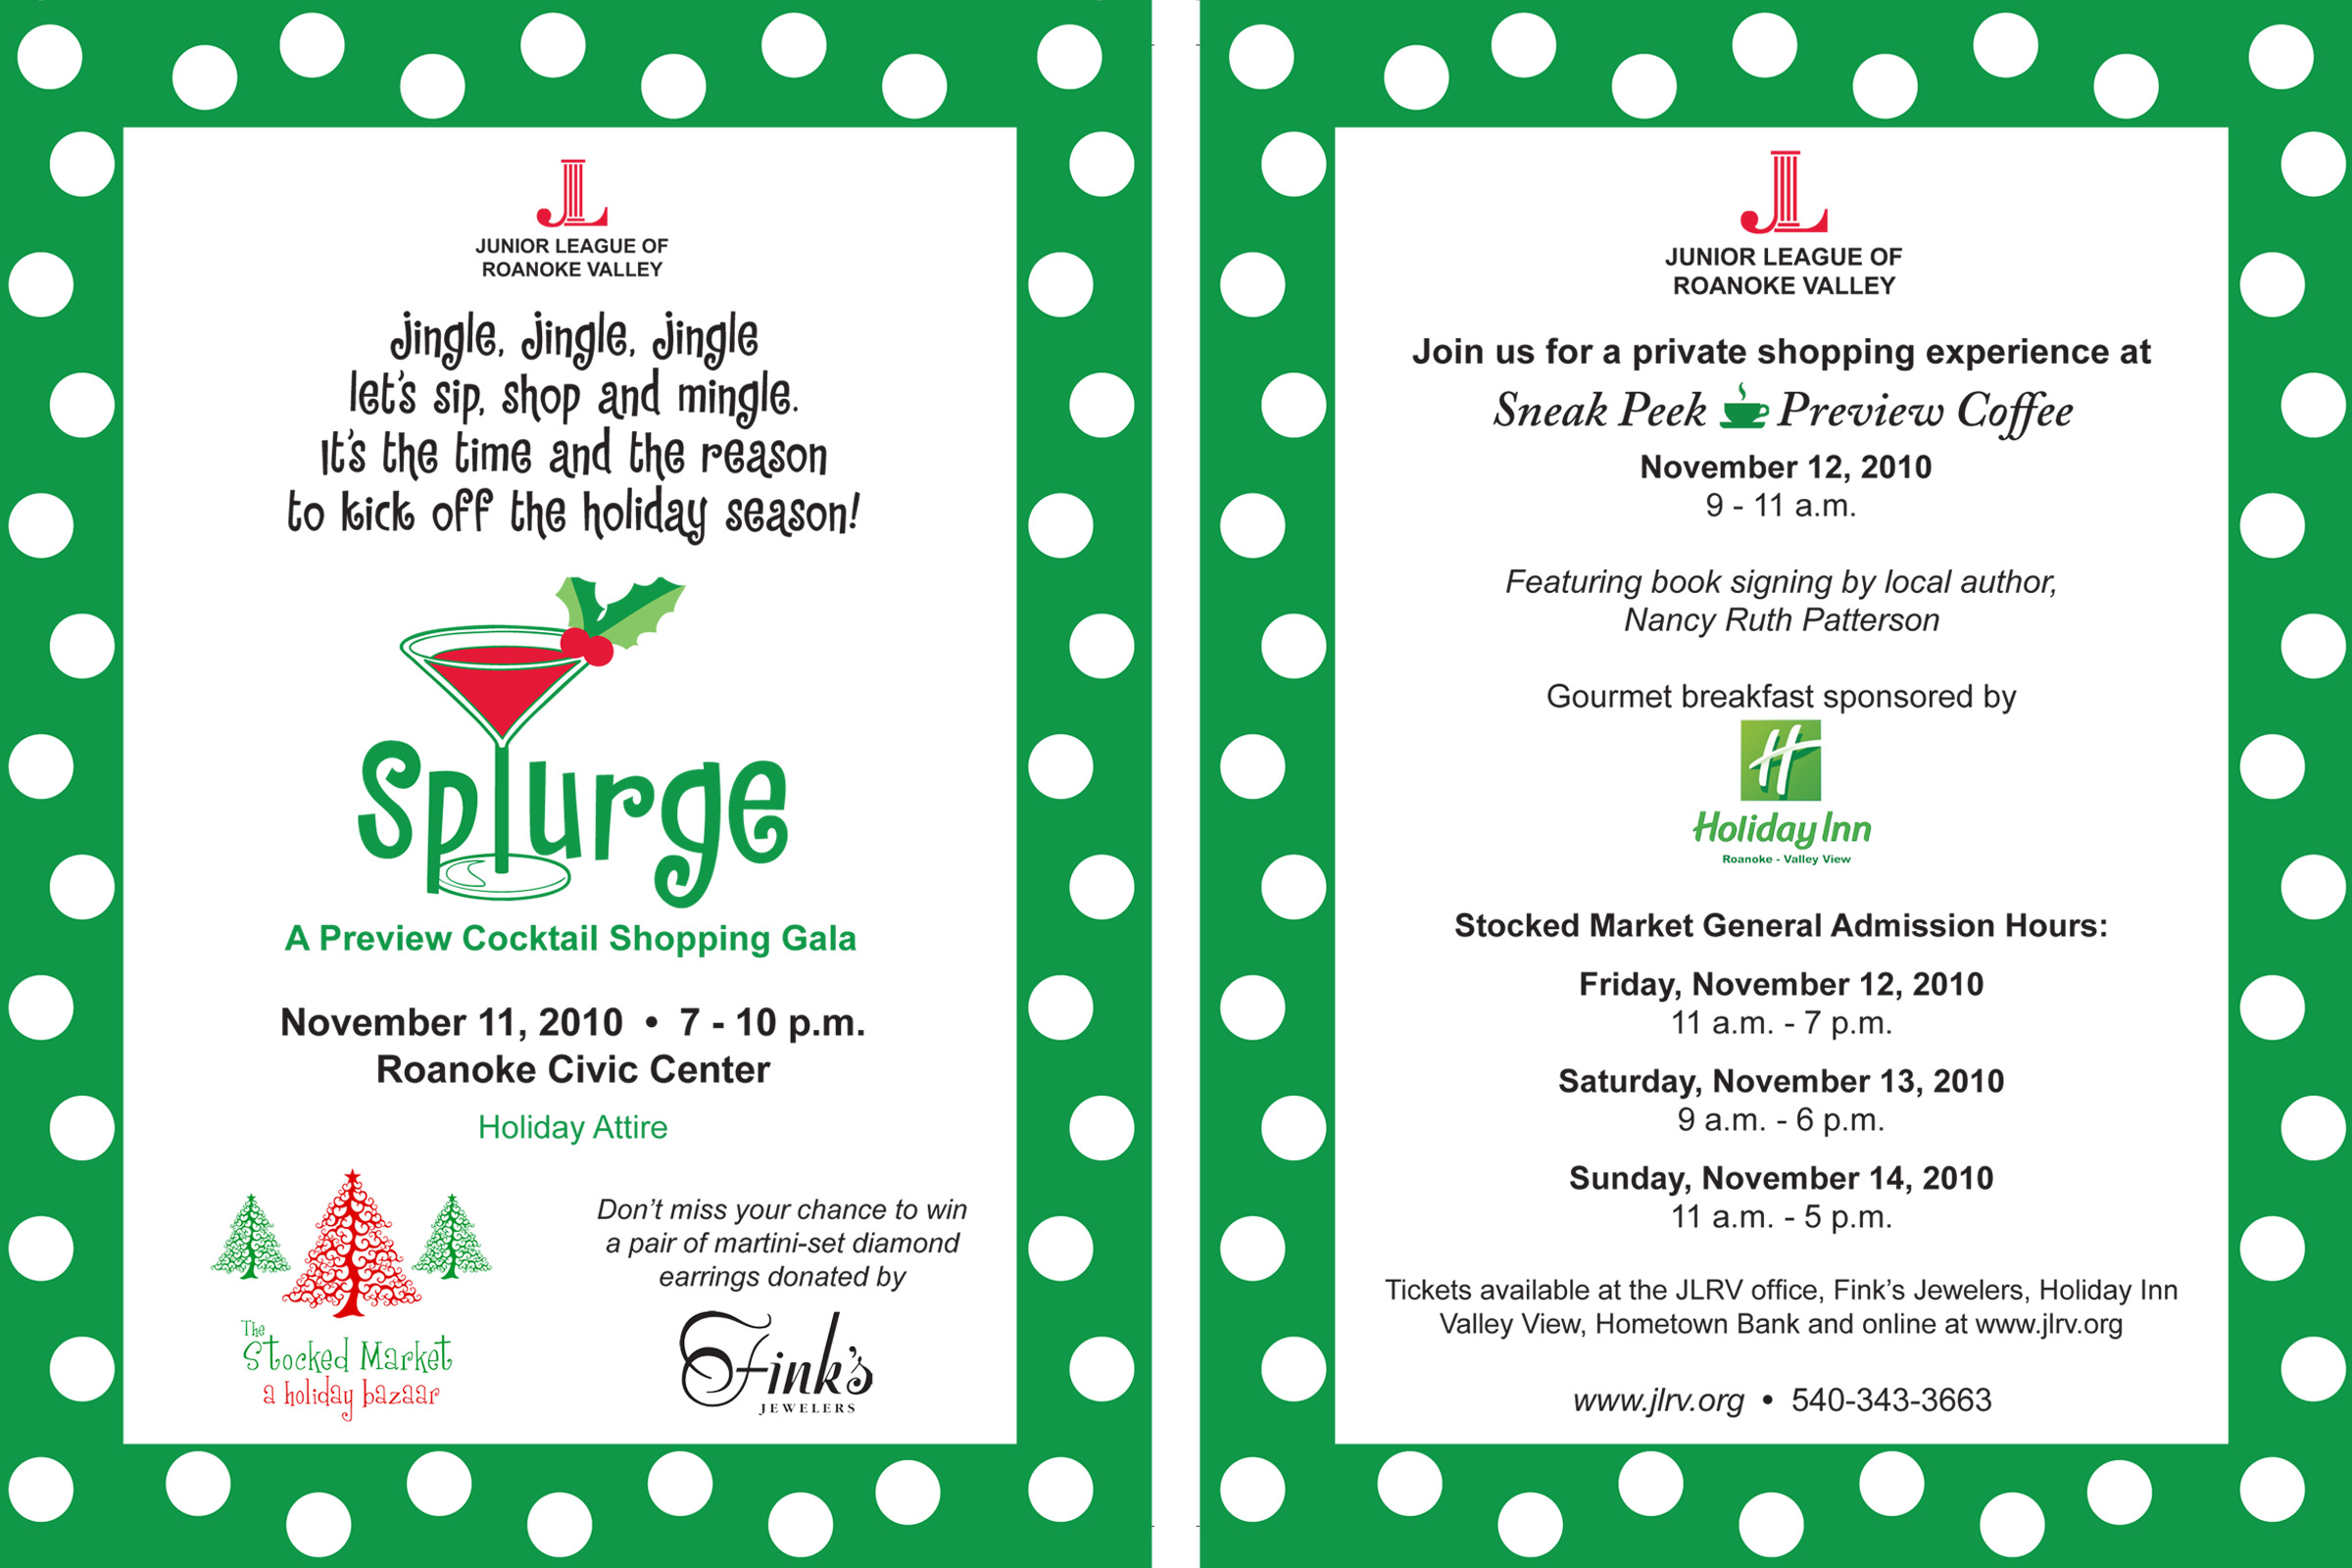 SPLURGE-2010-invite-1.jpg